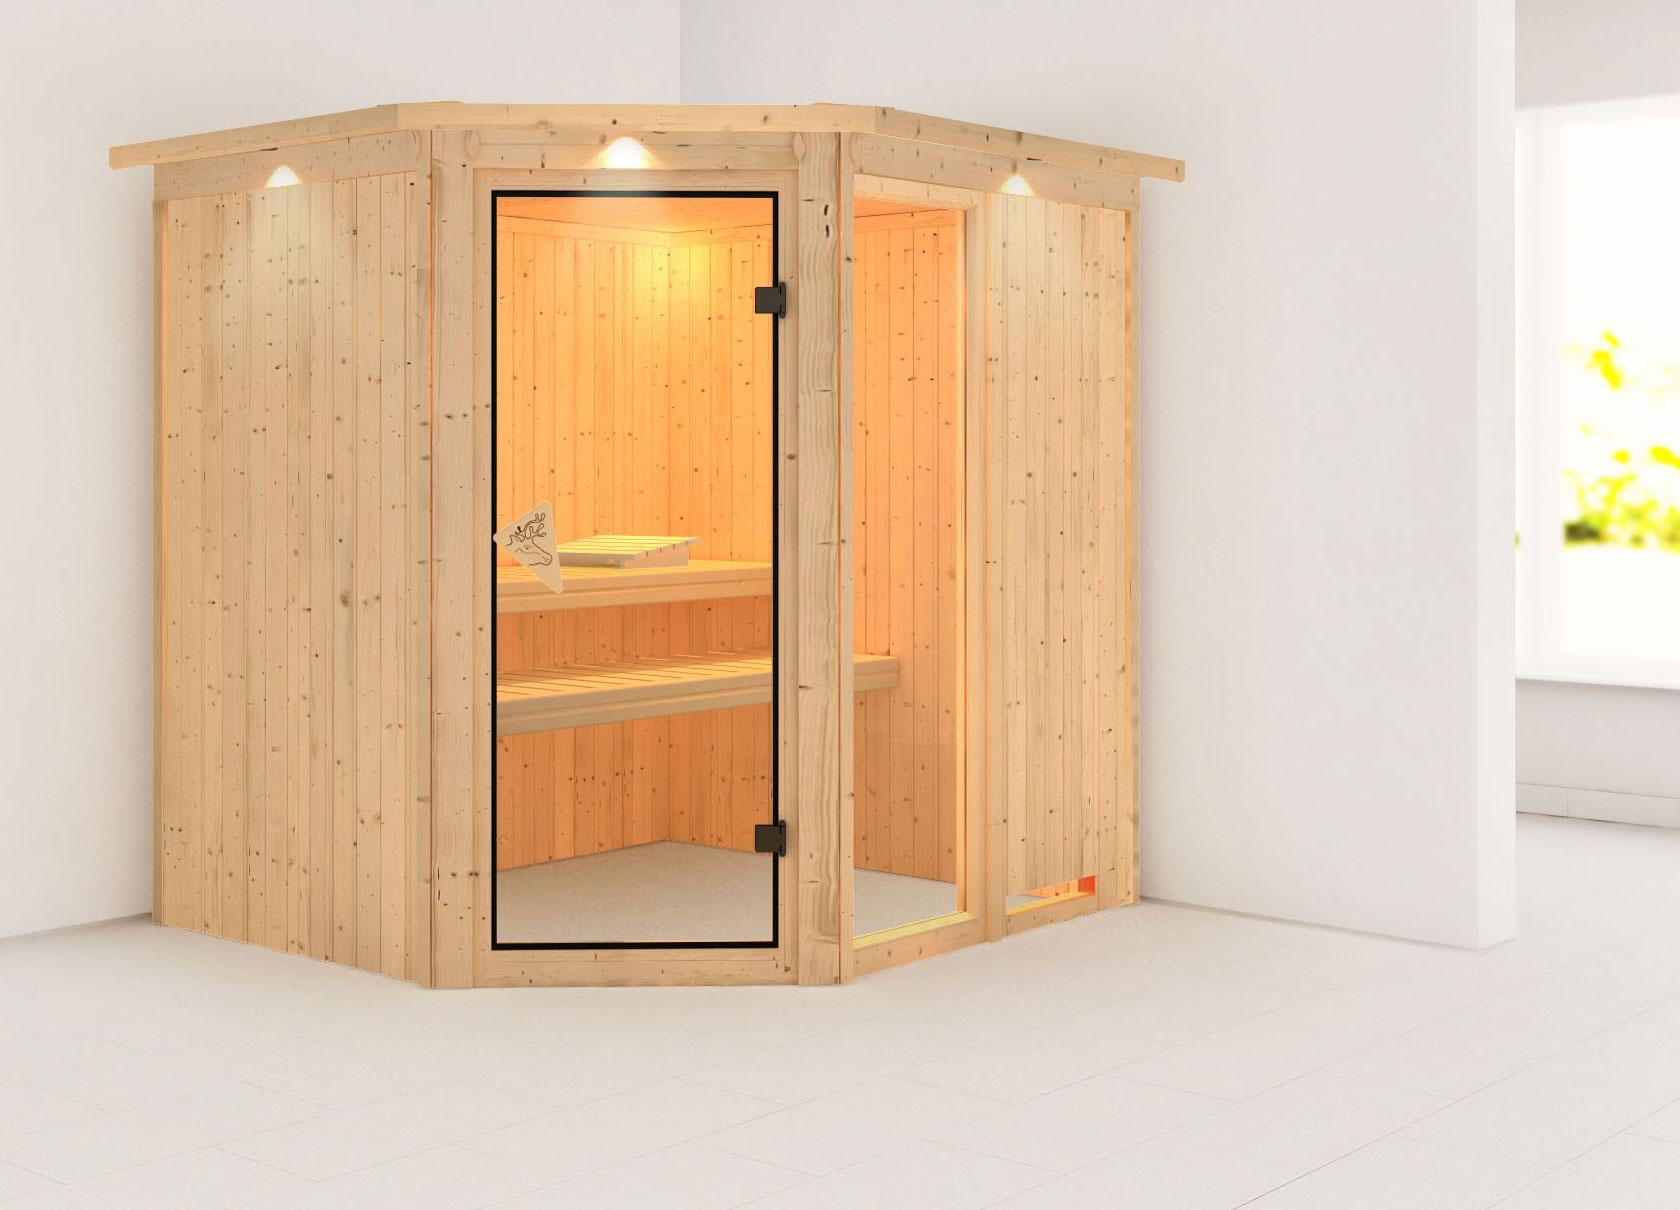 Karibu Sauna Fiona 2 68mm Dachkranz ohne Ofen classic Tür Bild 1